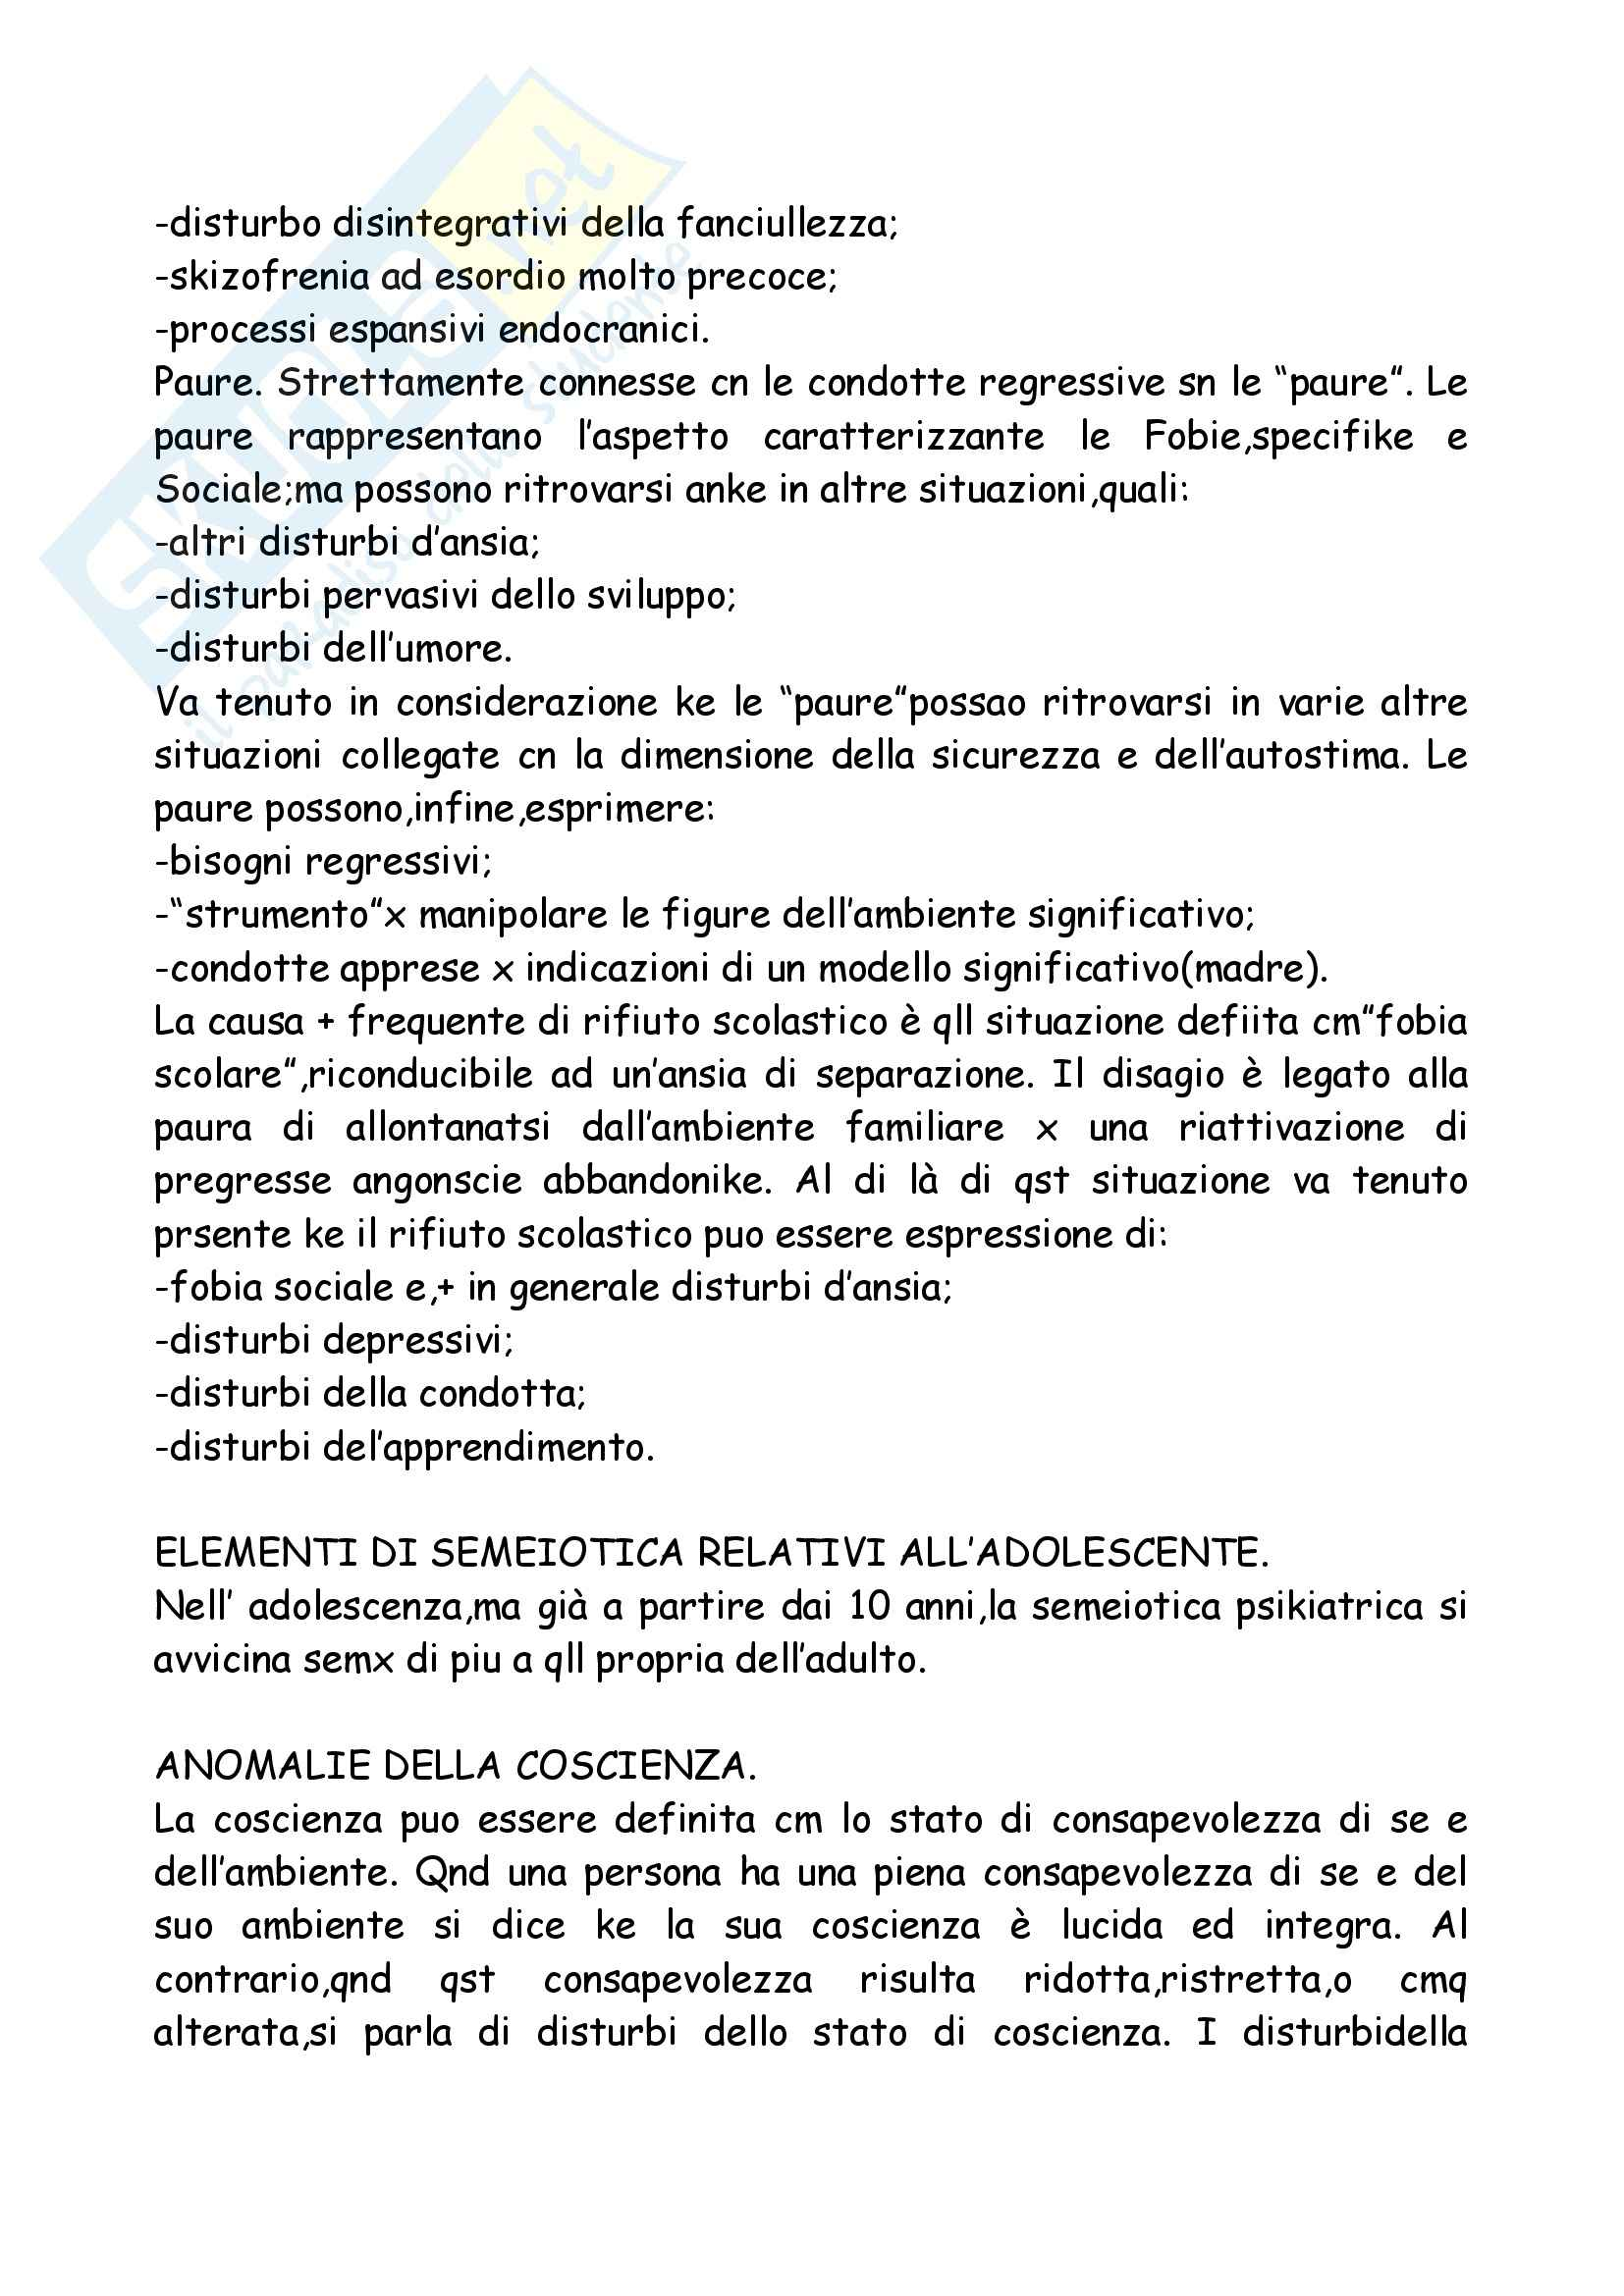 Neuropsichiatria Infantile Pag. 46